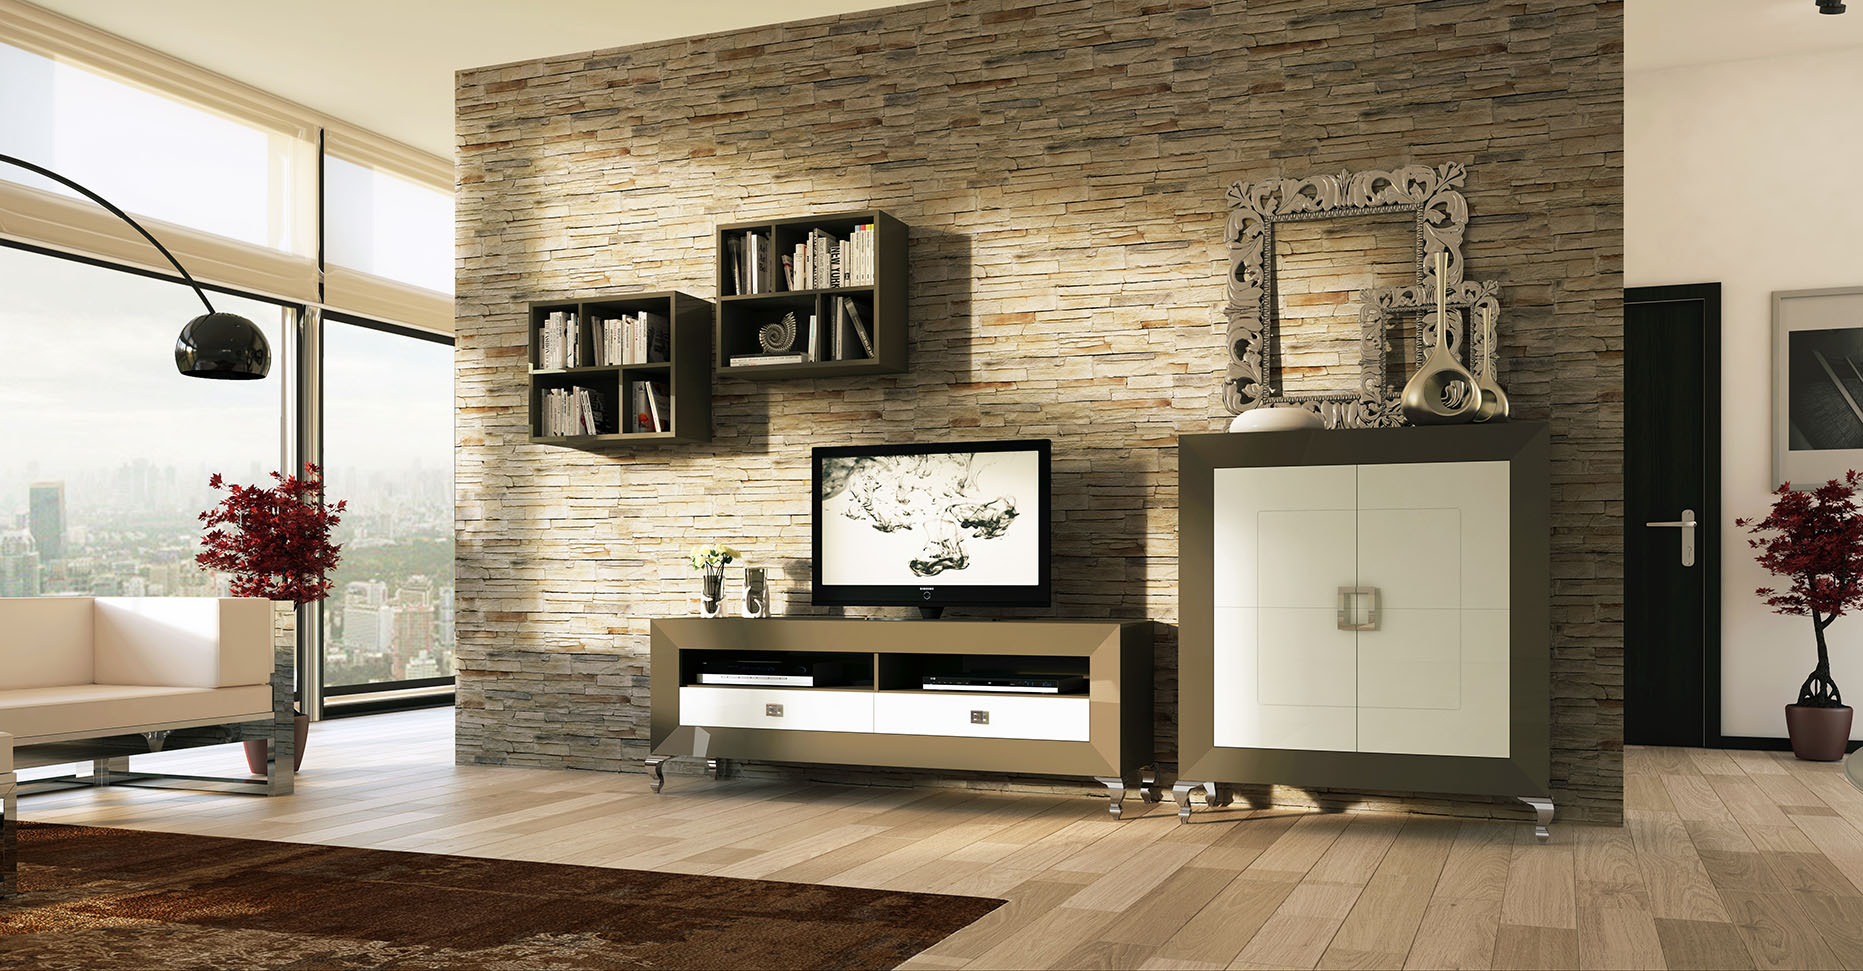 salon-contemporaneo-Basik-muebles-paco-caballero-1231-5c93923ca311a